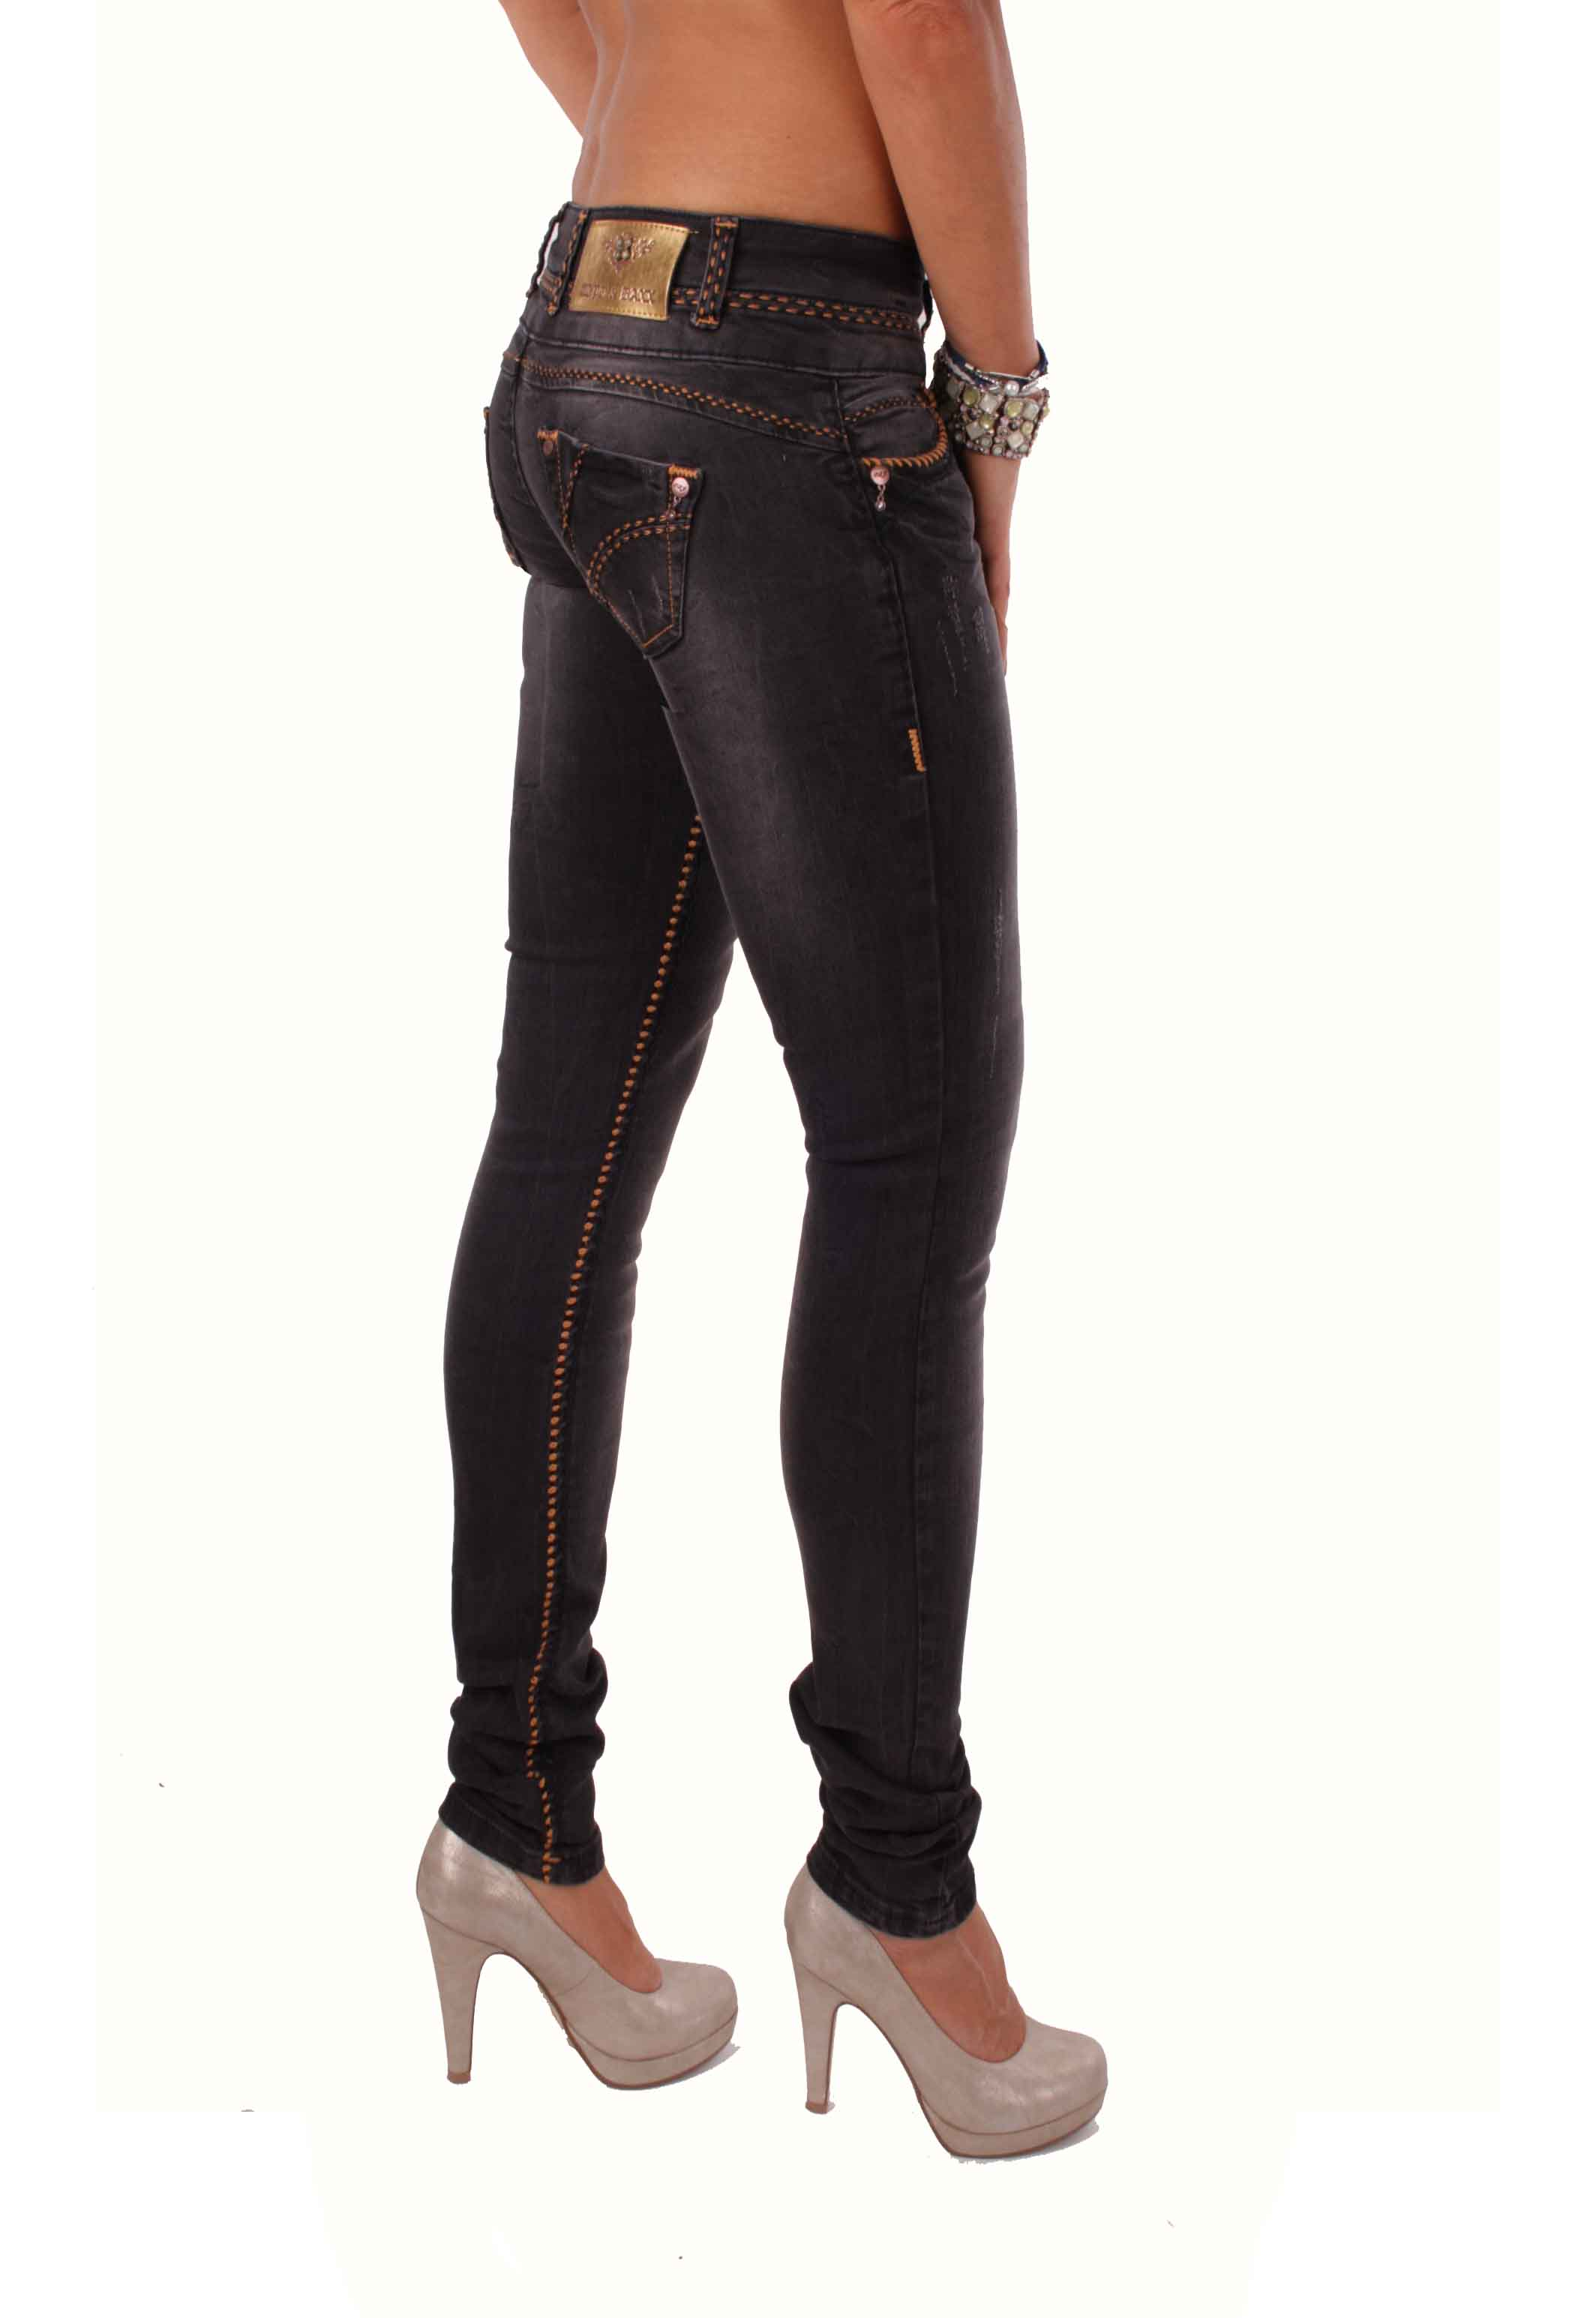 cipo baxx damen jeans hose dicke n hte cbw 0483 schwarz. Black Bedroom Furniture Sets. Home Design Ideas